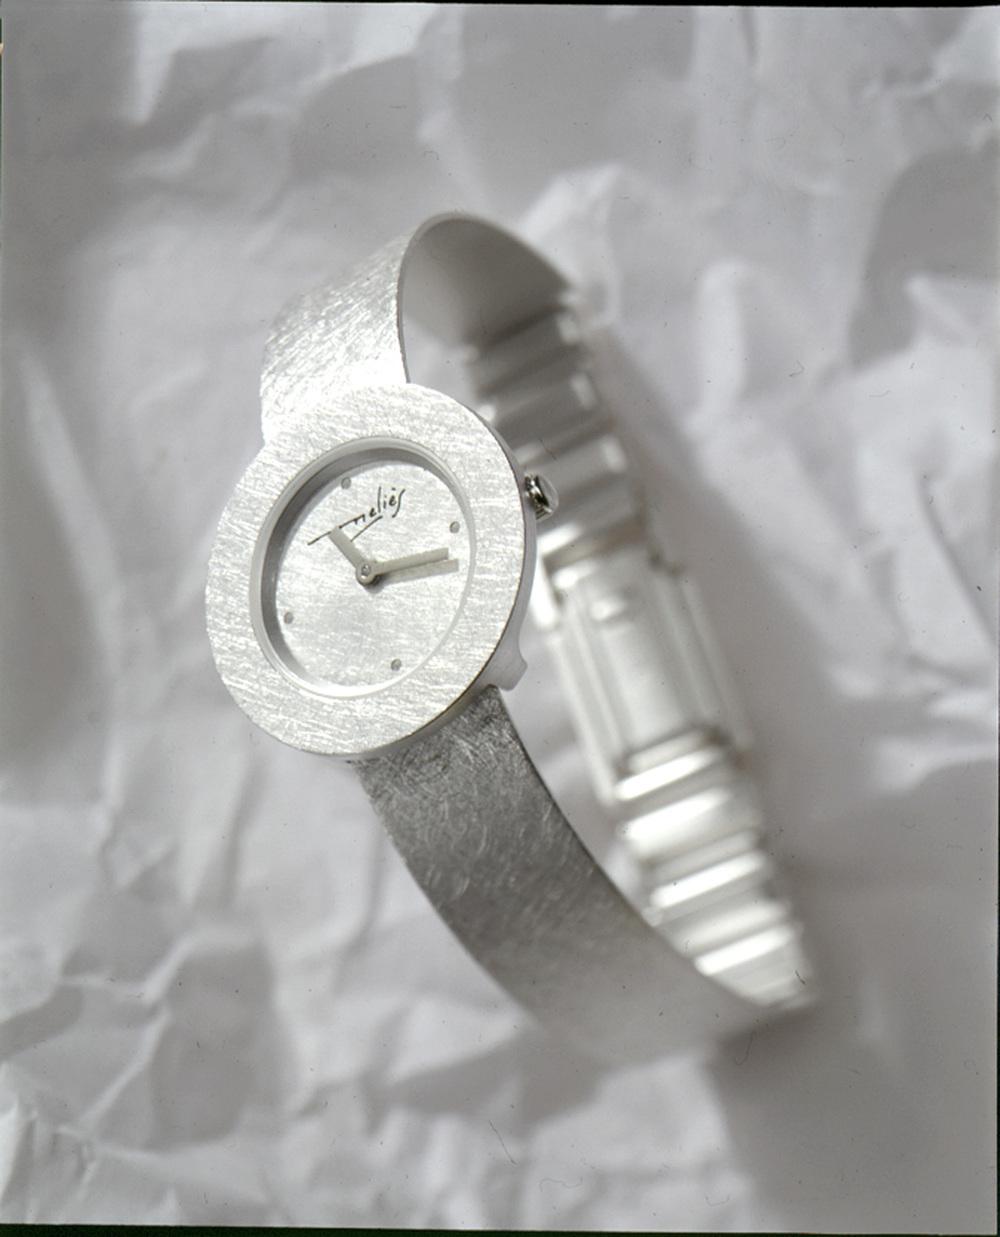 Silver Watch_2Kpx.jpg